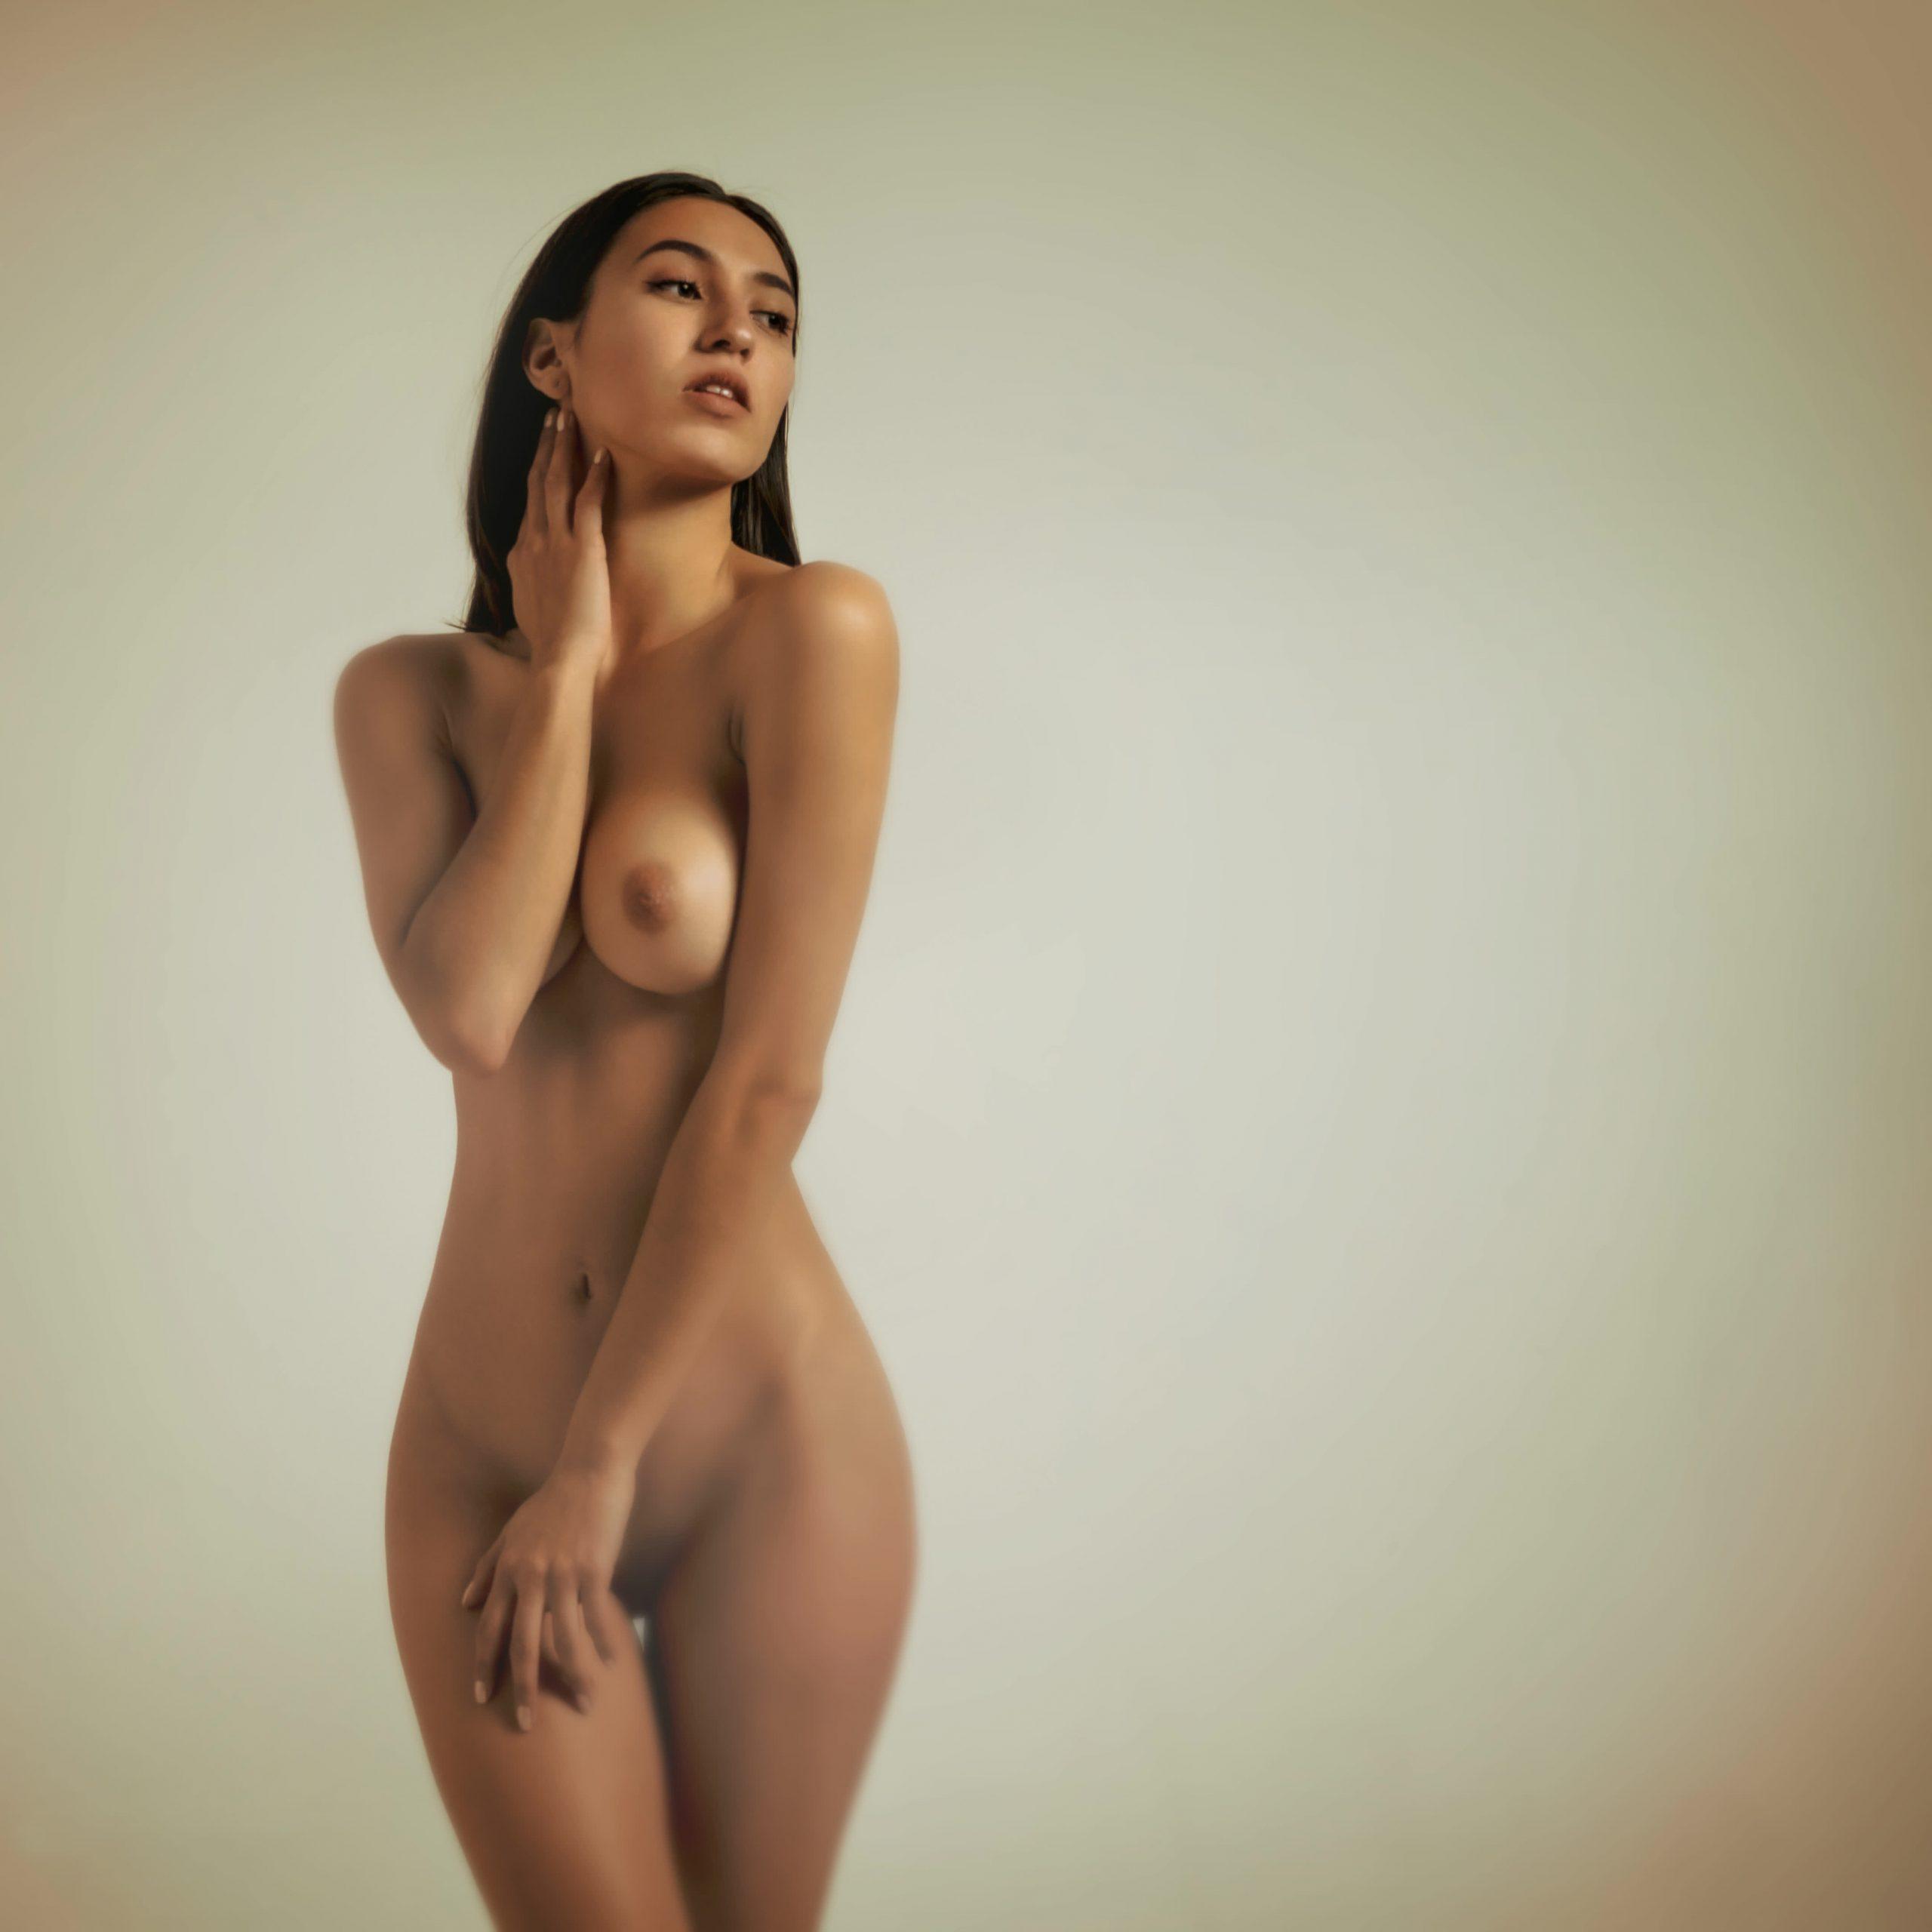 Deisy Leon - Chris Bingham photoshoot